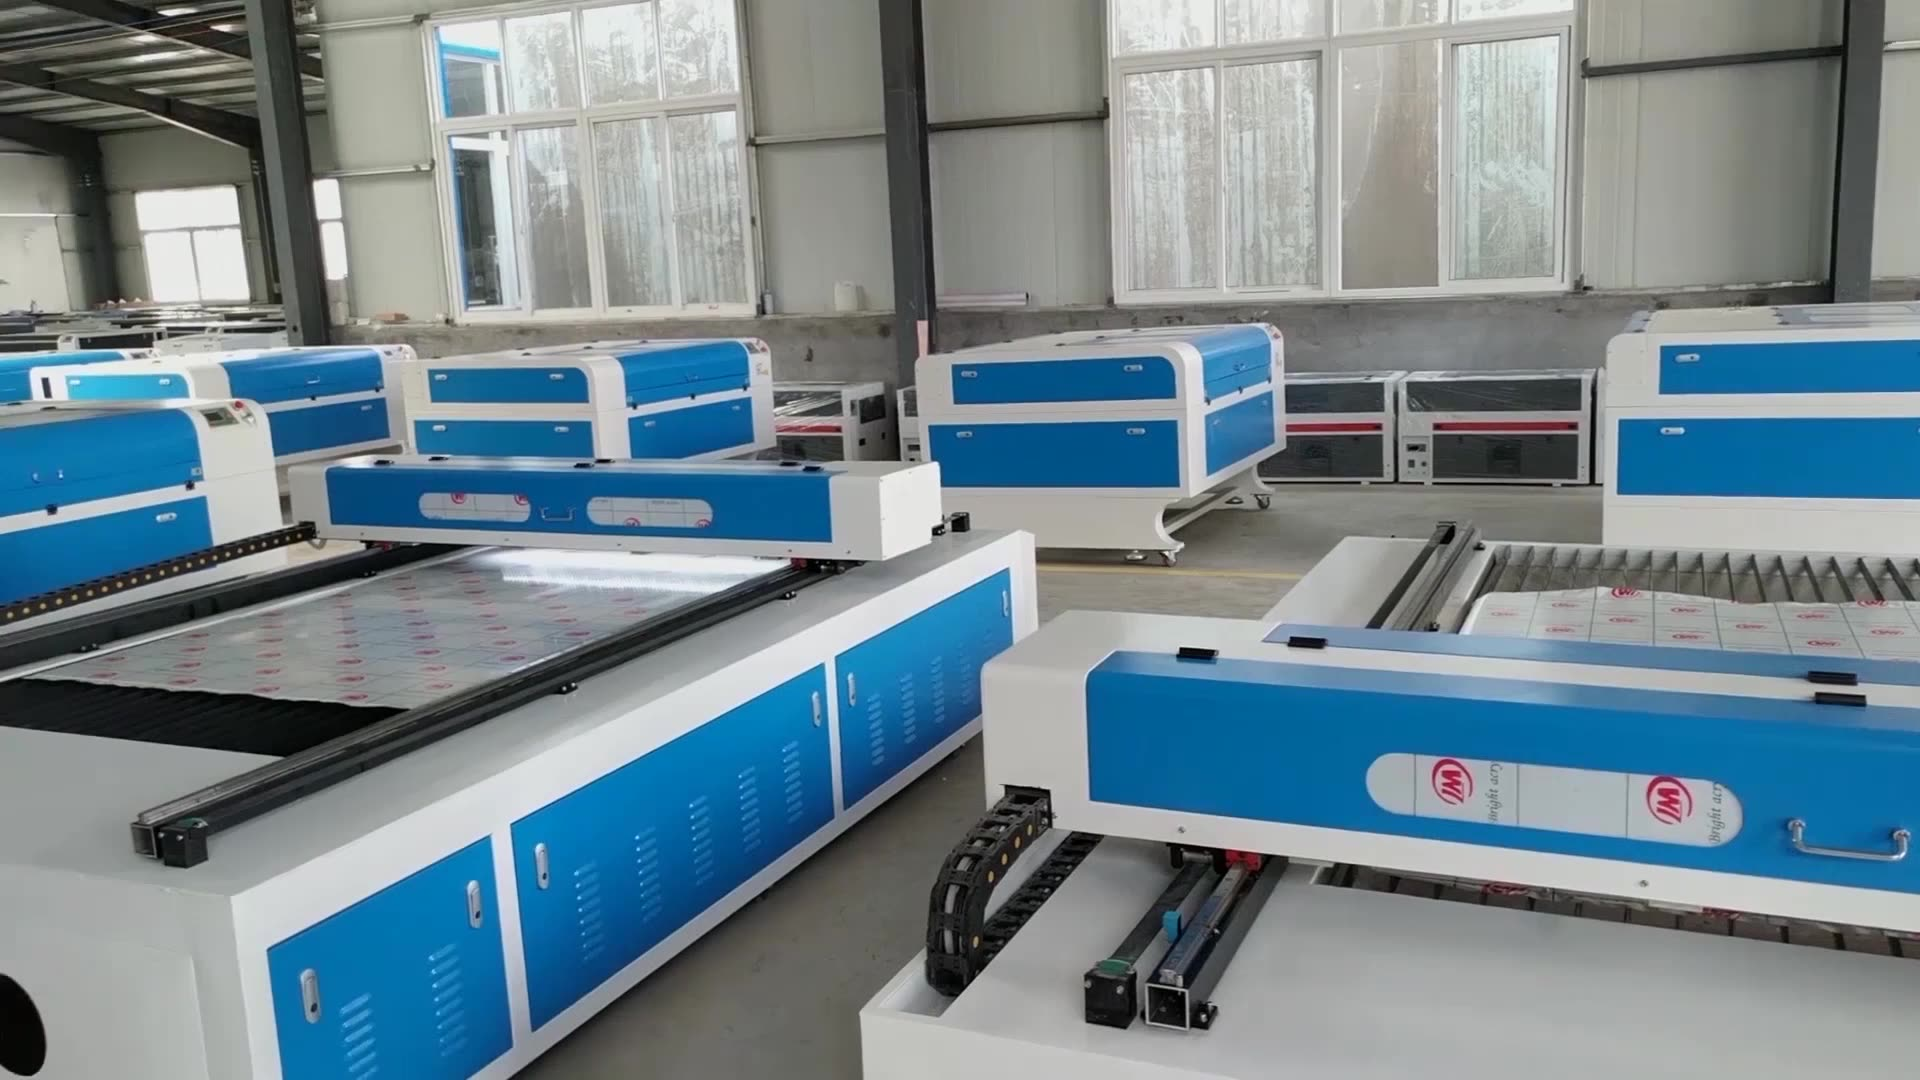 100W Desktop co2 laser marking machine for printing logo on wood acrylic MDF 110x110mm Sino-Galvo RC2808 BJJCZ  board